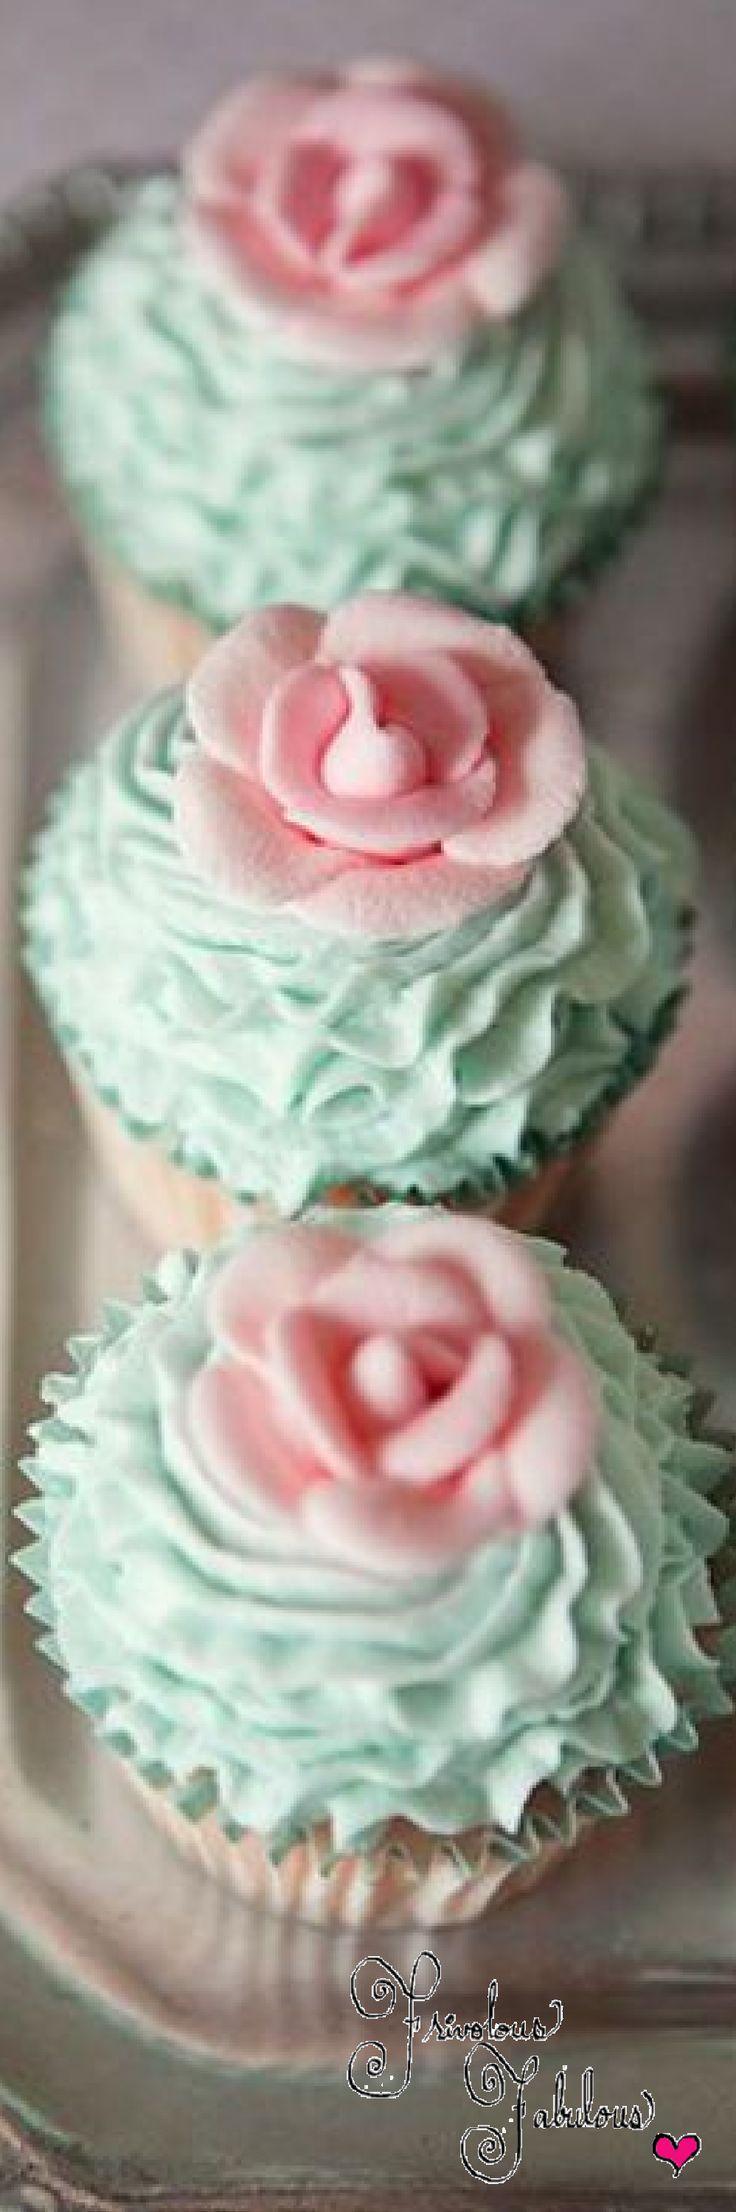 Frivolous Fabulous - Gorgeous Blue and Pink Cupcakes